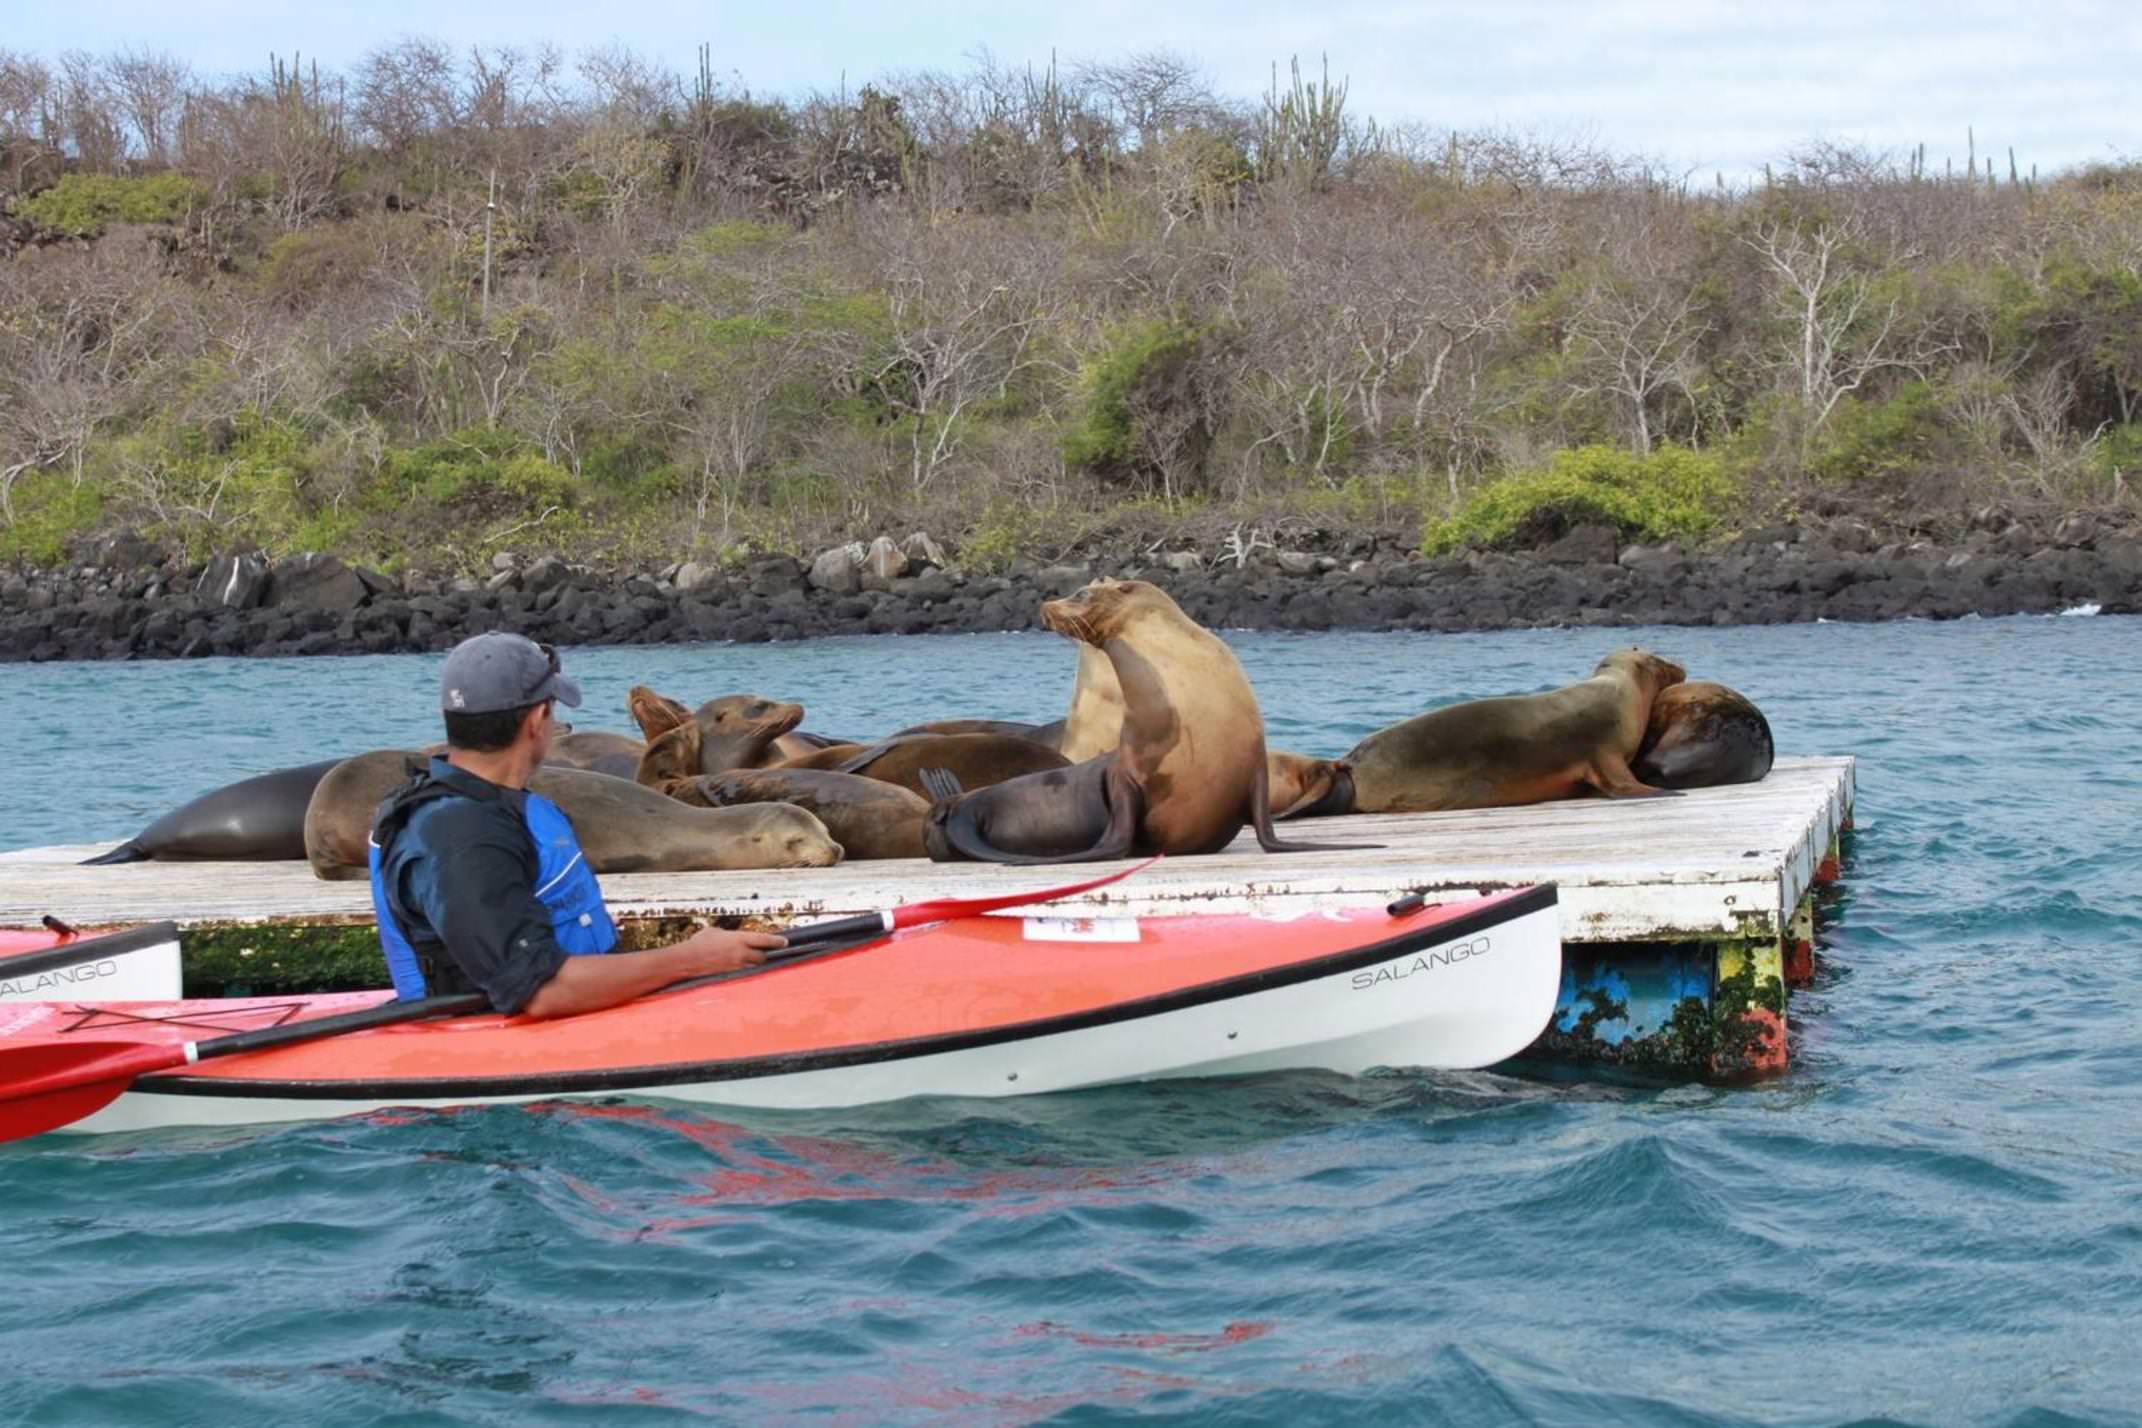 Ecuador galapagos islands land based galapagos kayak alongside sea lions20180829 76980 1blhzzh